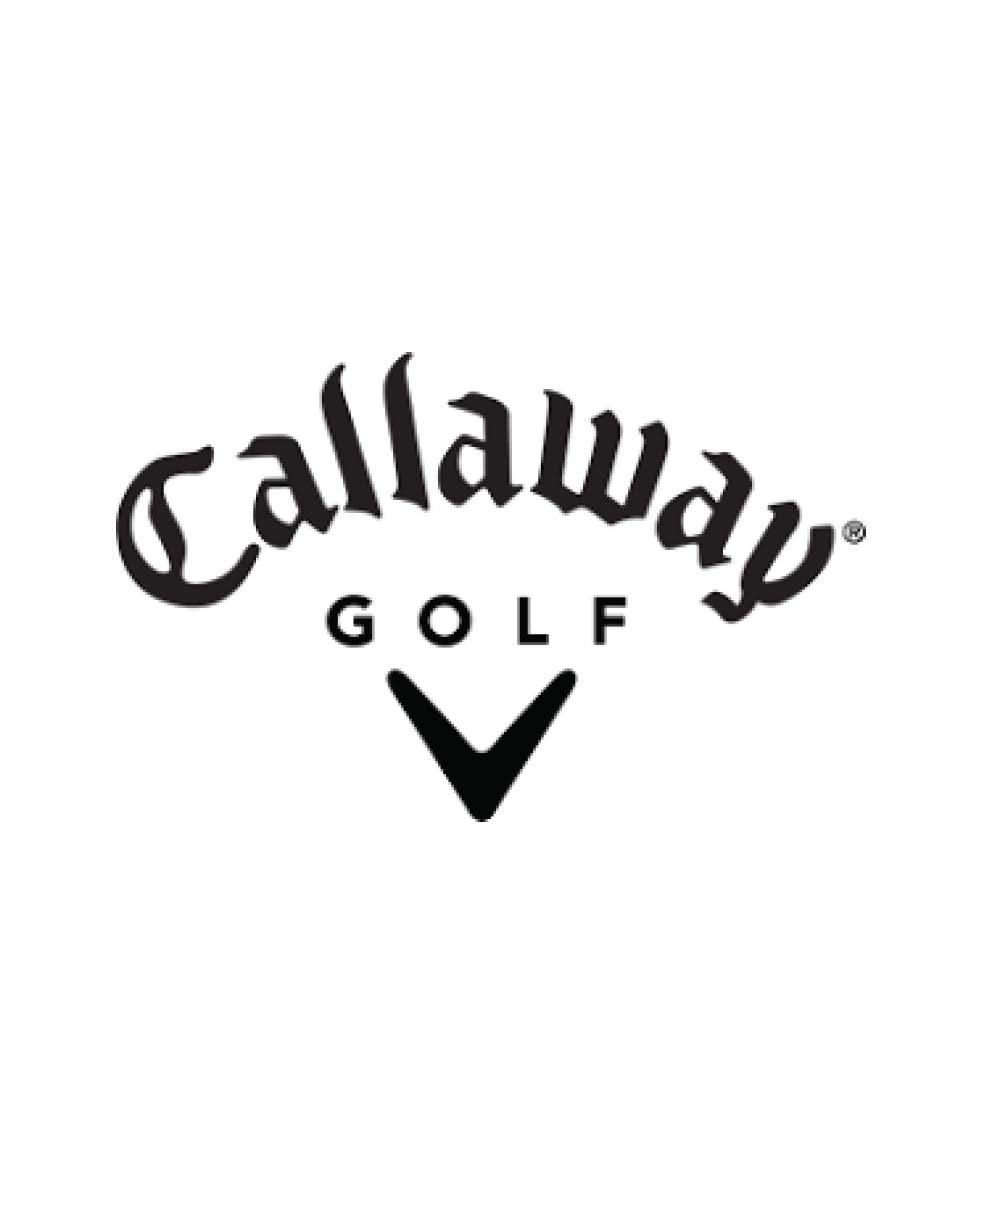 Promo Logos - Callaway.jpg